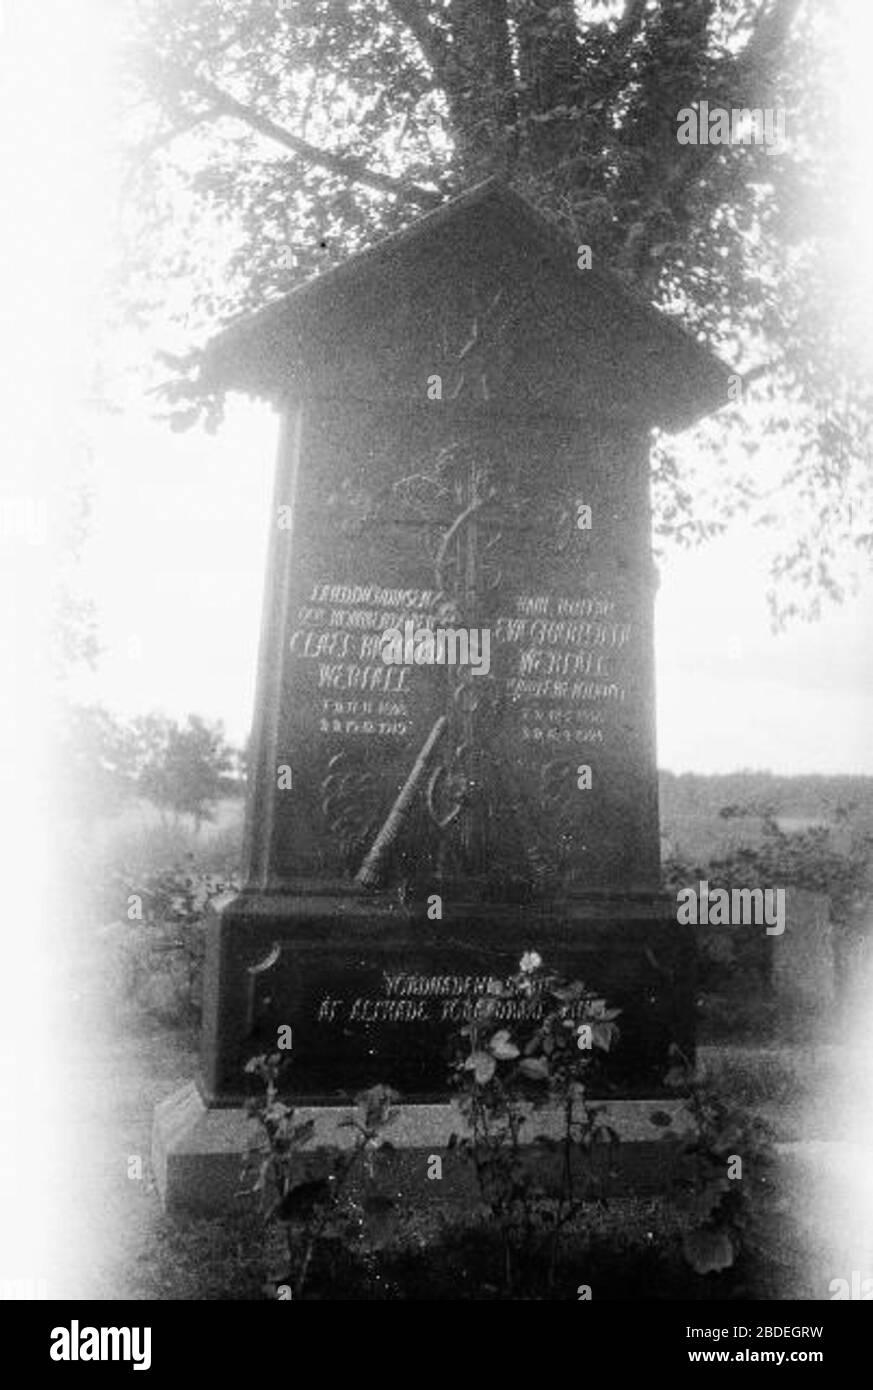 Grdens gravar - Stiftelsen Kulturmiljvrd